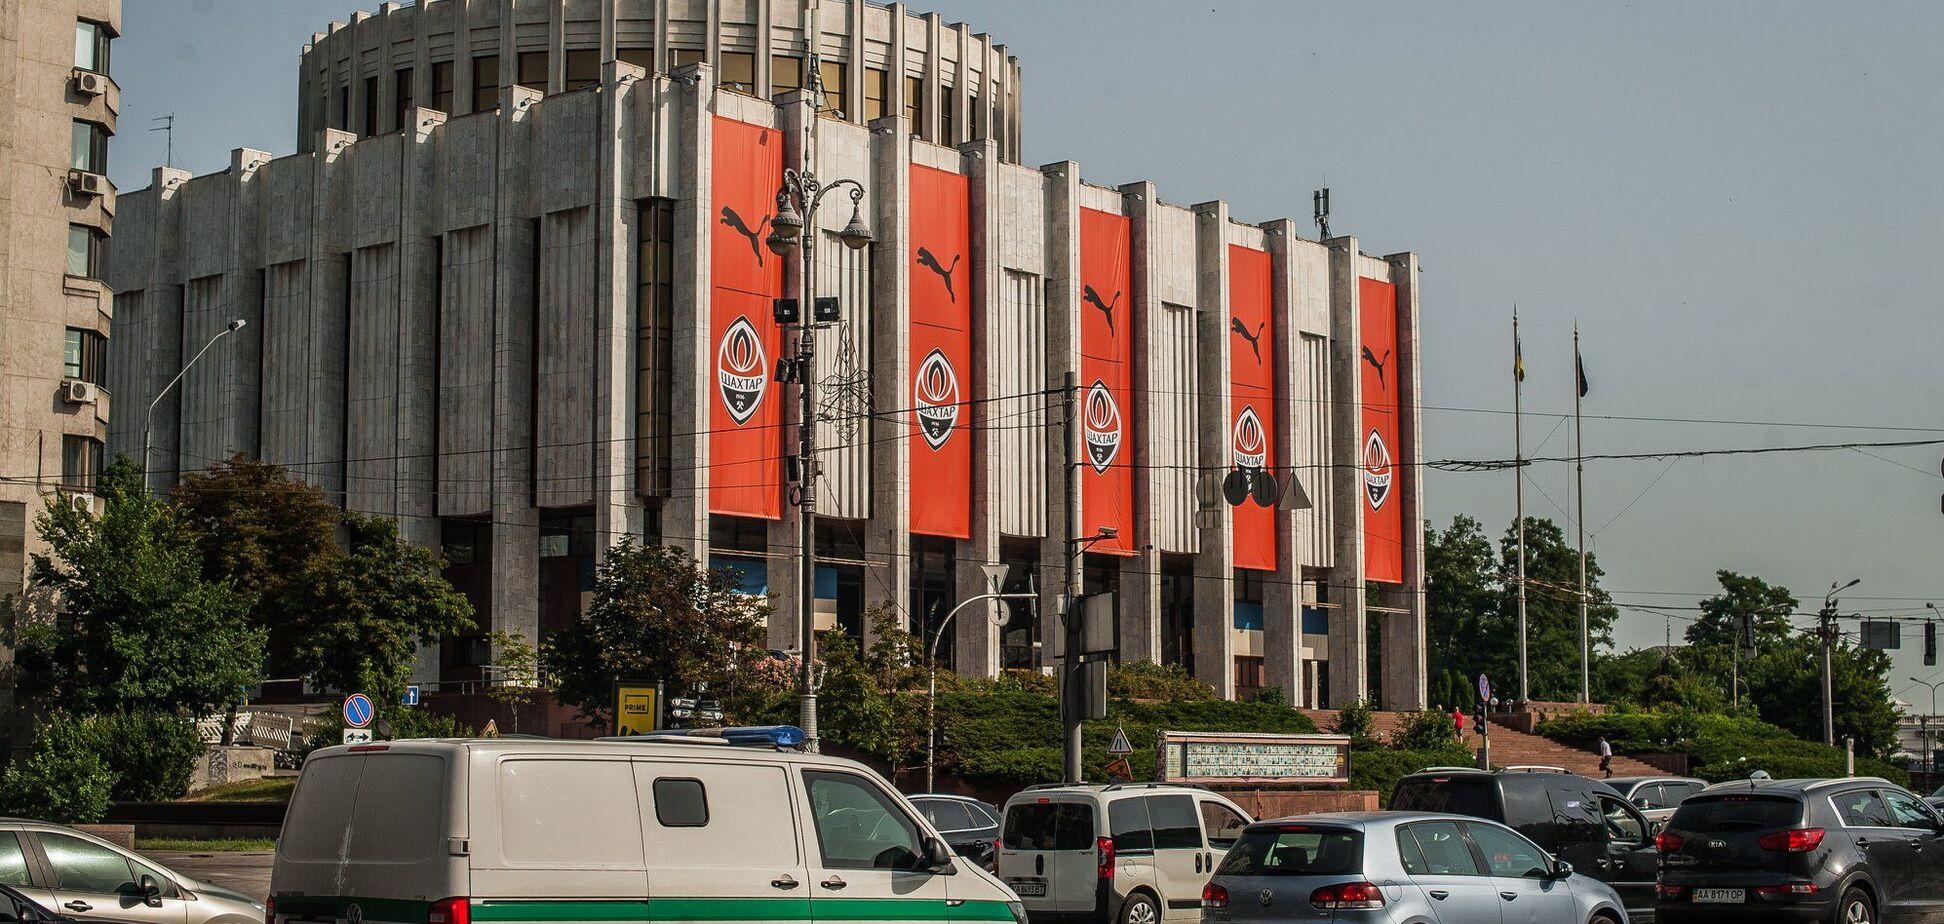 ФК Шахтер украинский дом